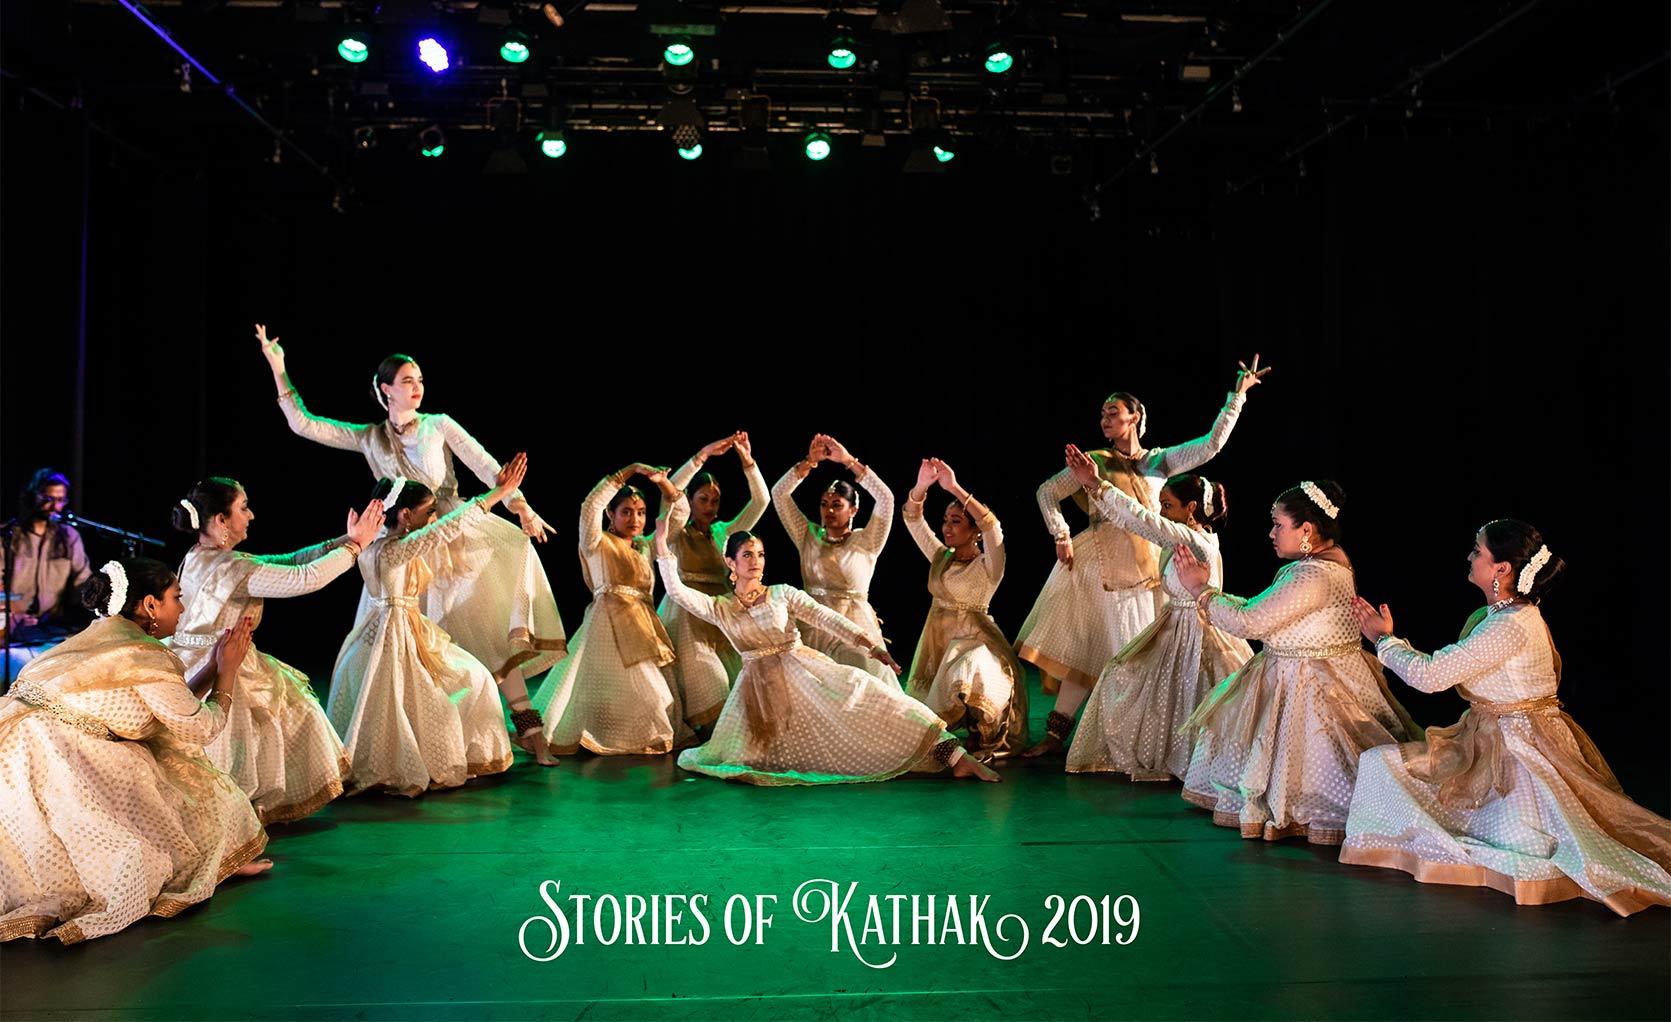 Stories of Kathak 2019